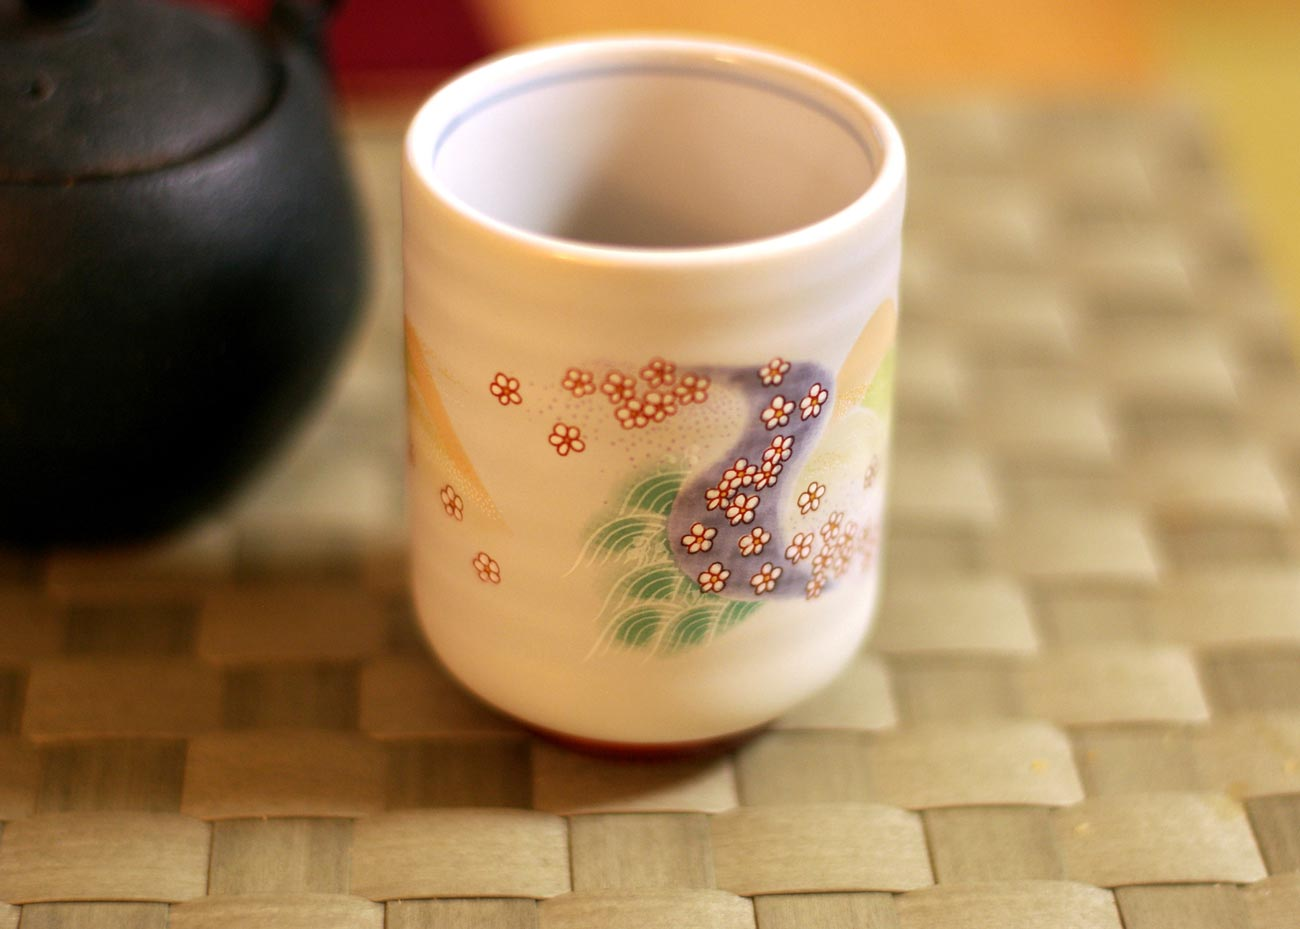 ©  Pelican  / Flickr Creative Commons, Kutani-Yaki Cup